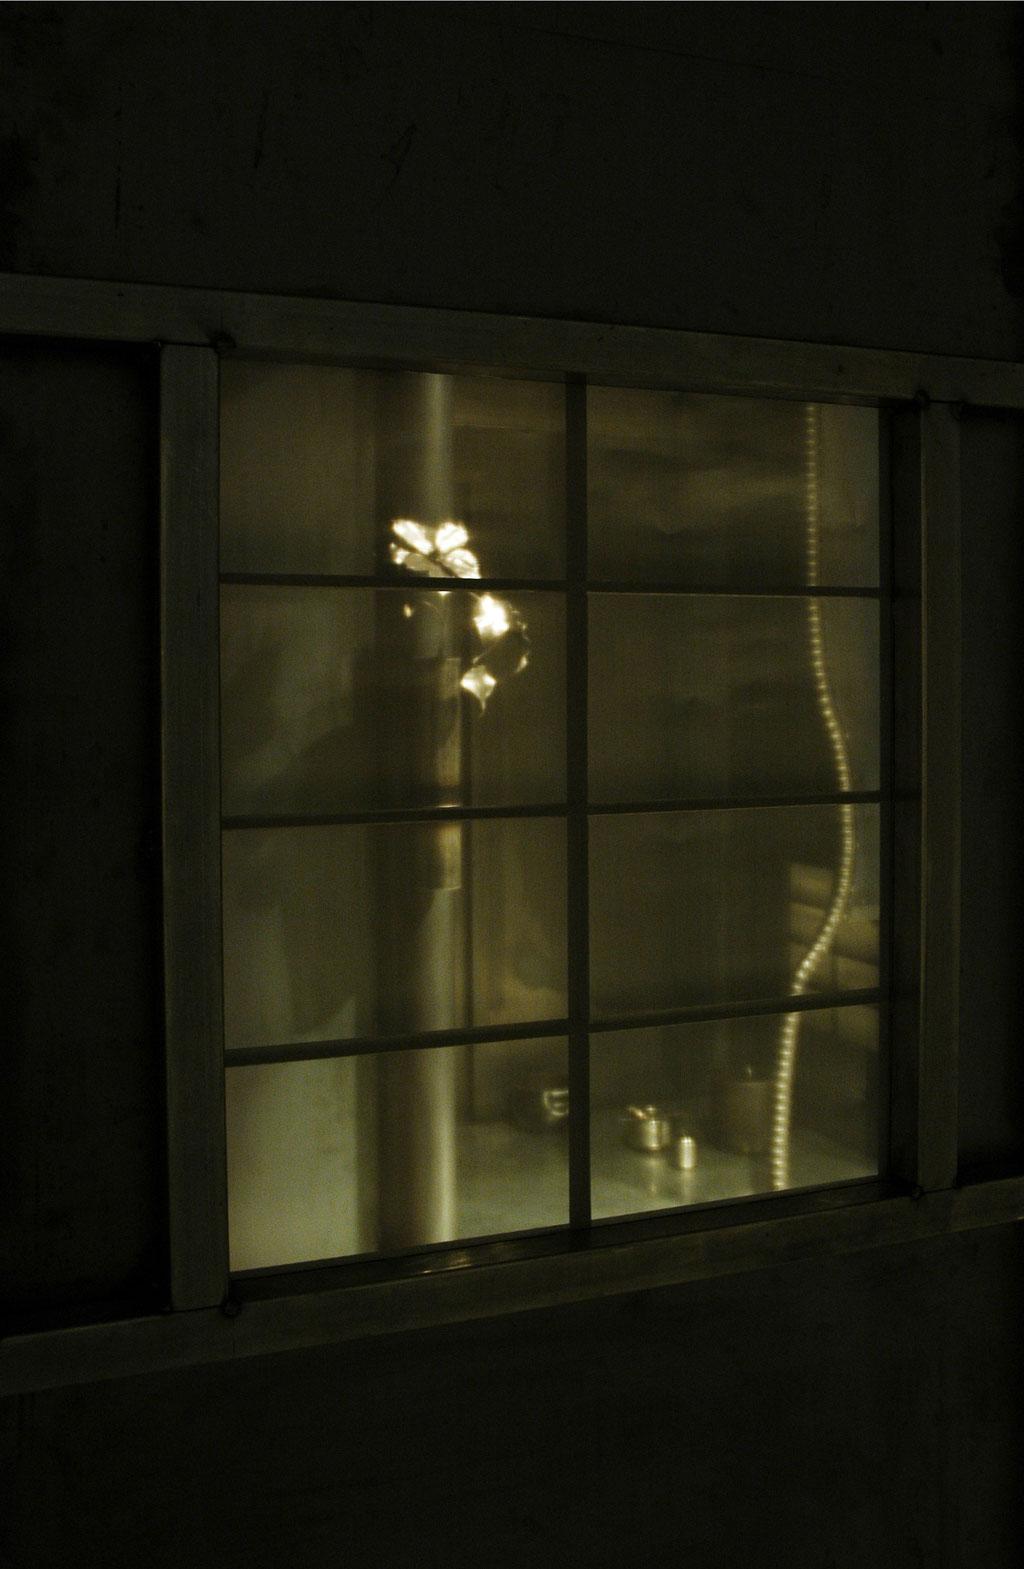 鉄茶室徹亭、墨跡窓越しの鉄仙